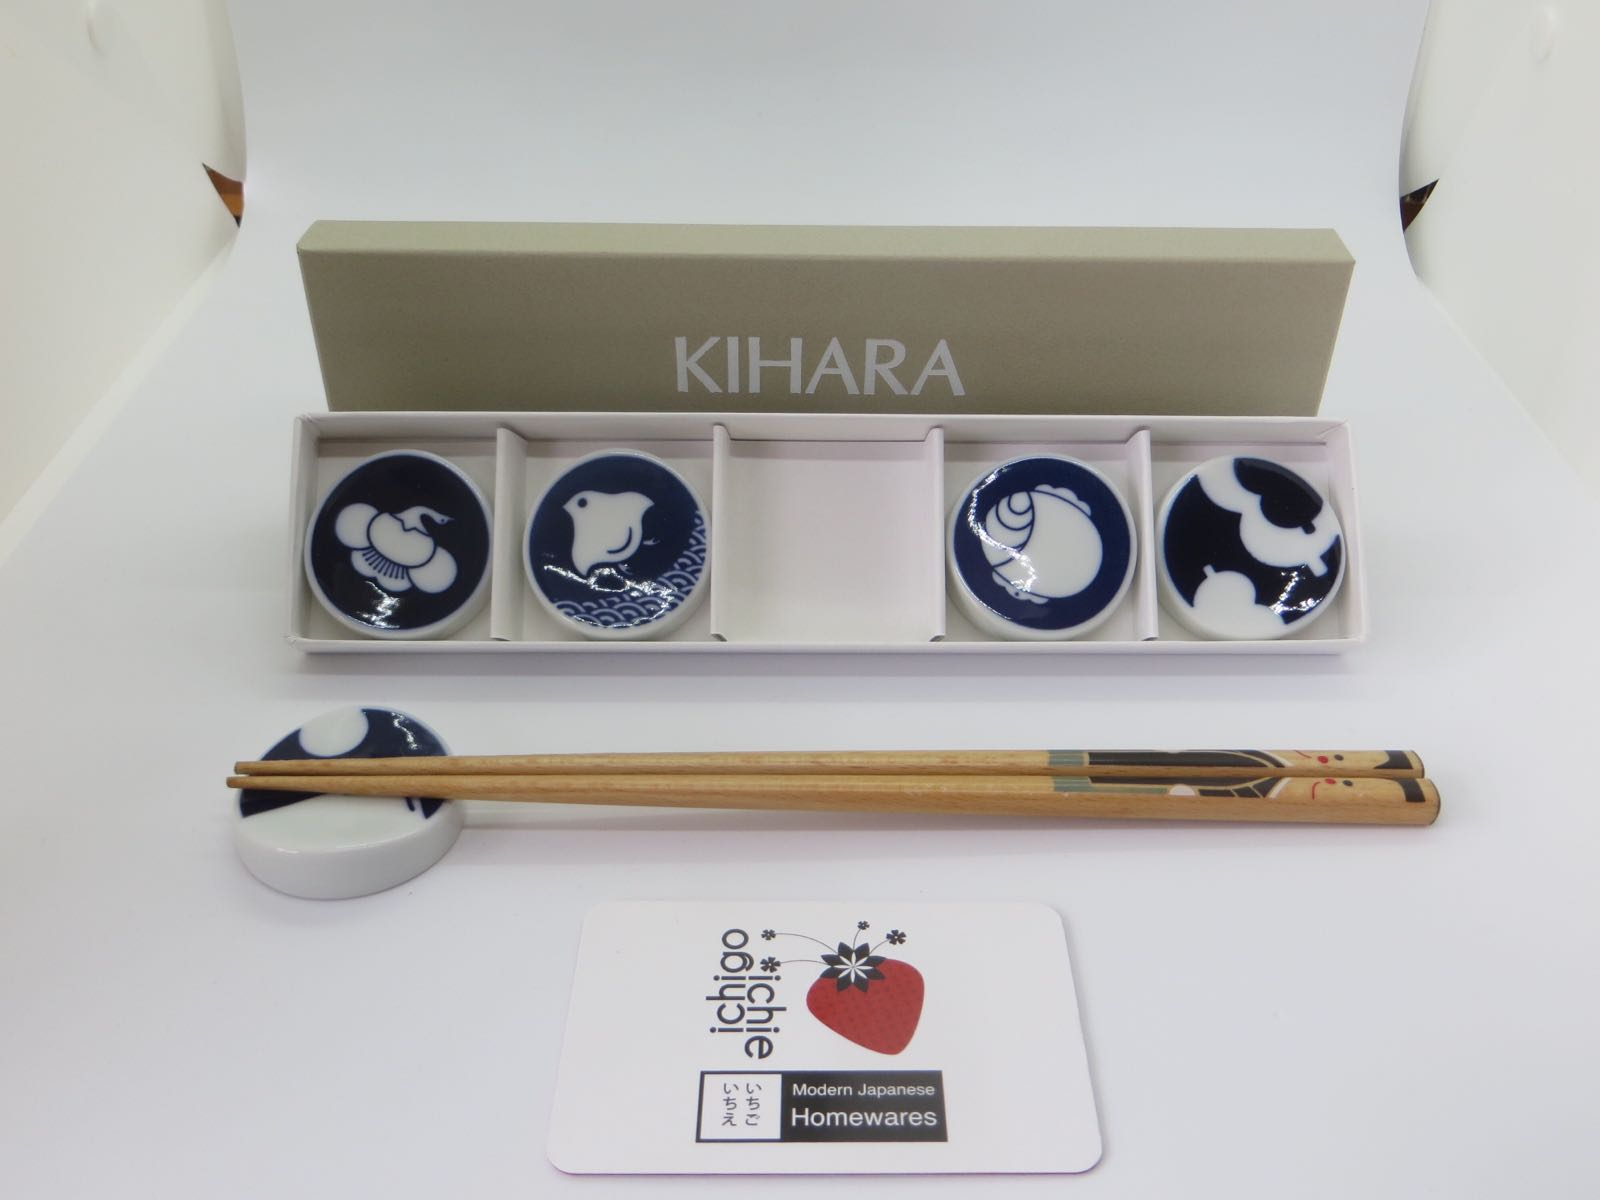 KIHARA Chopstick Holders Komon (Set of 5)